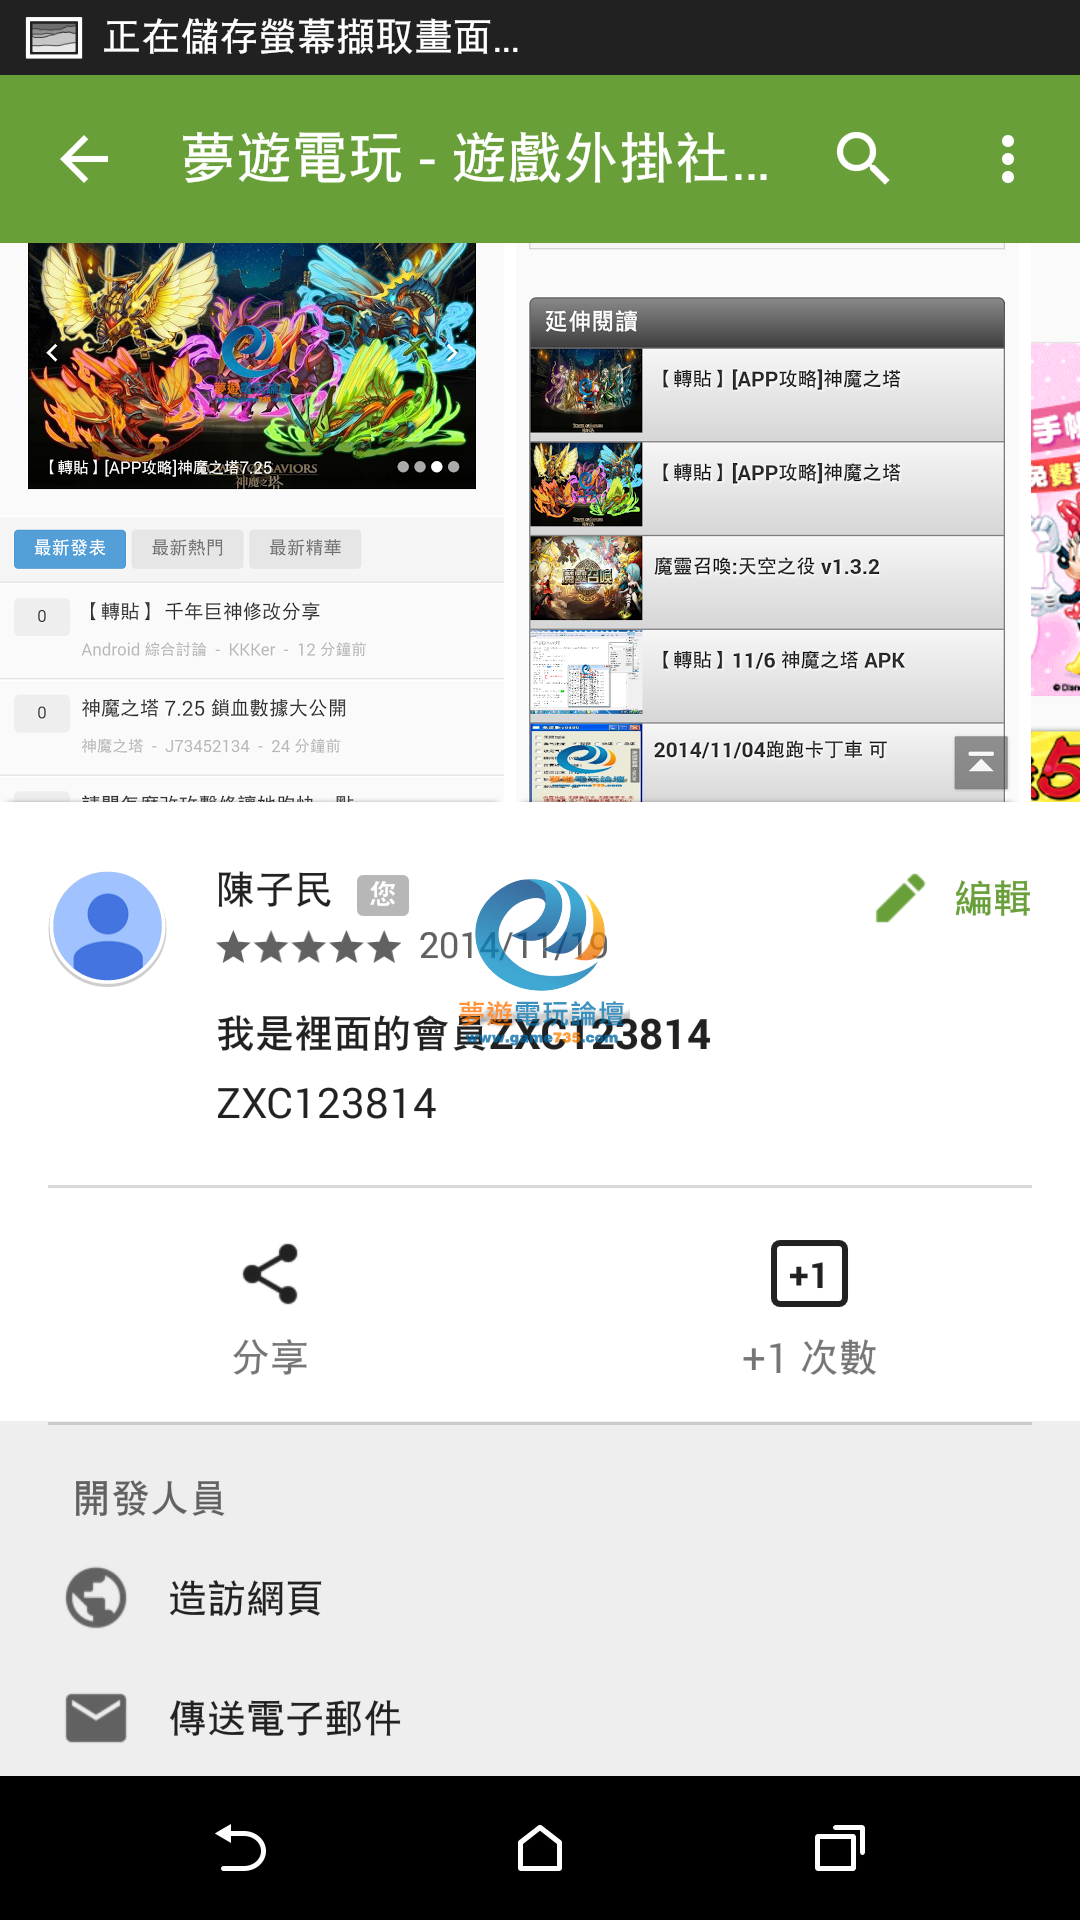 Screenshot_2014-11-19-23-04-21.png